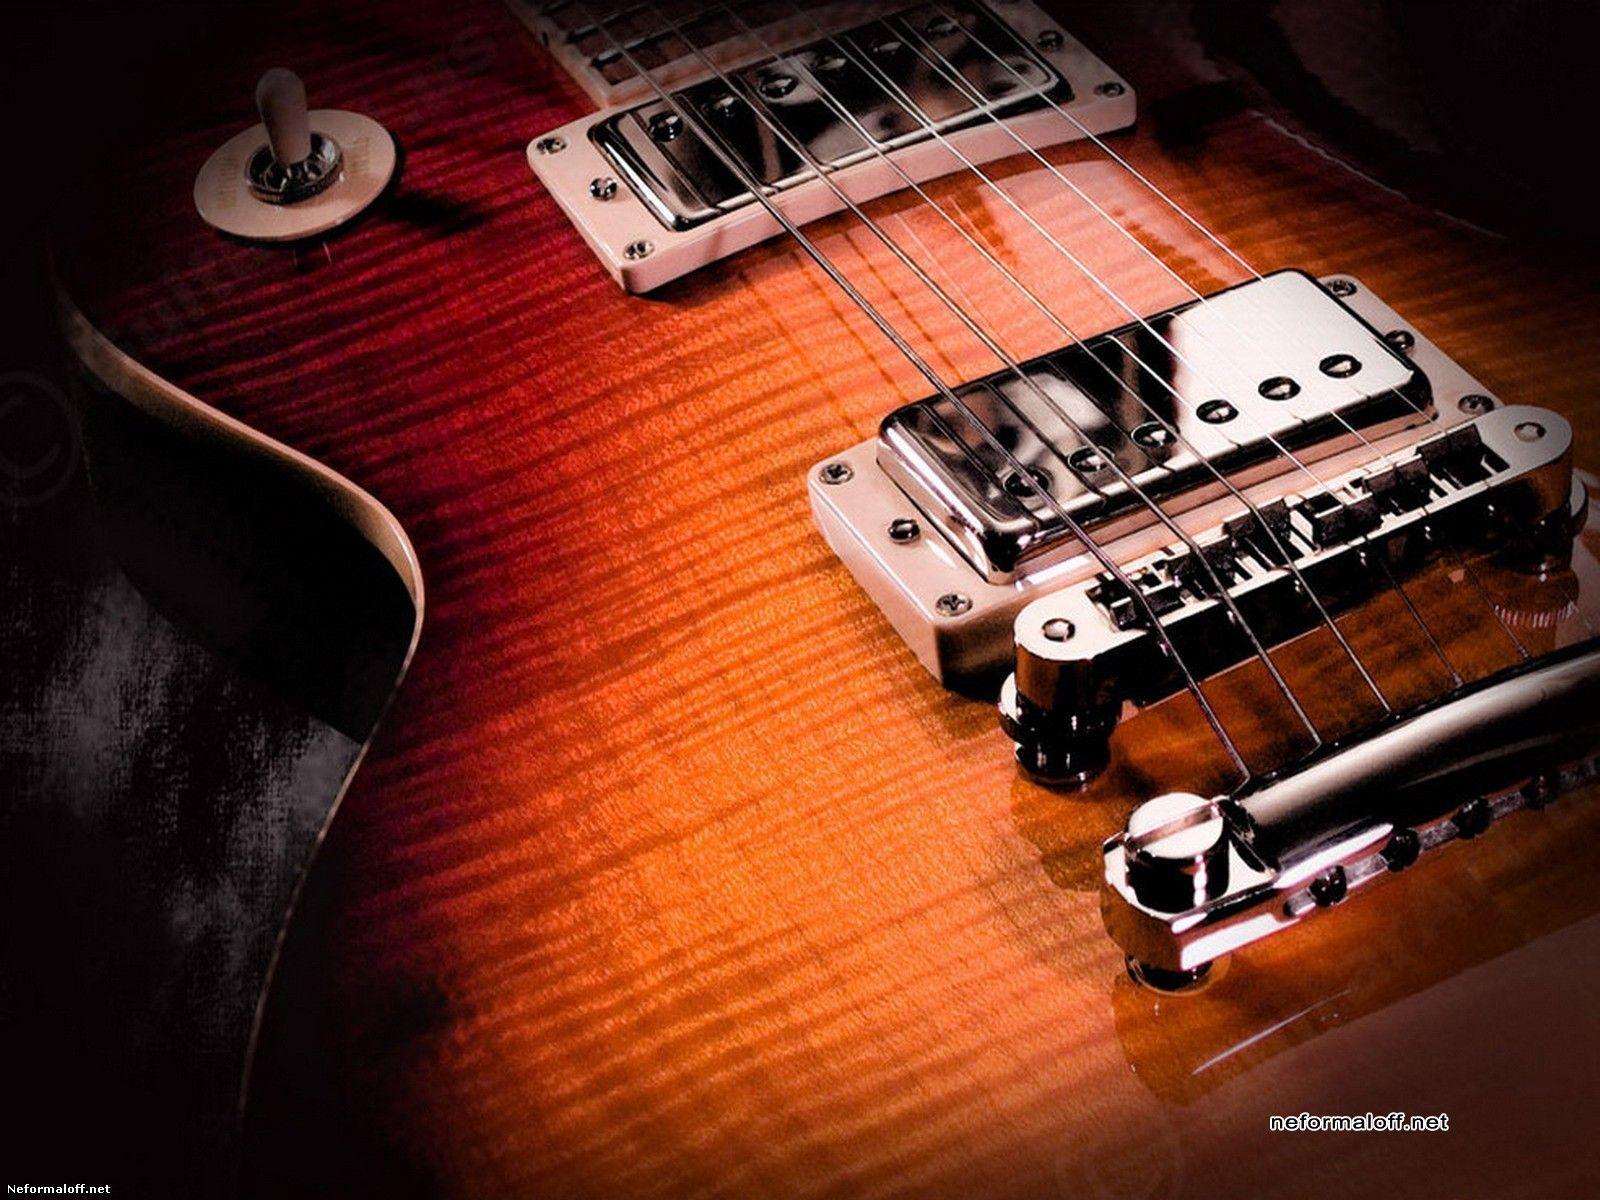 guitar hd wallpaper. | guitarra, instrumento musical de cuerda